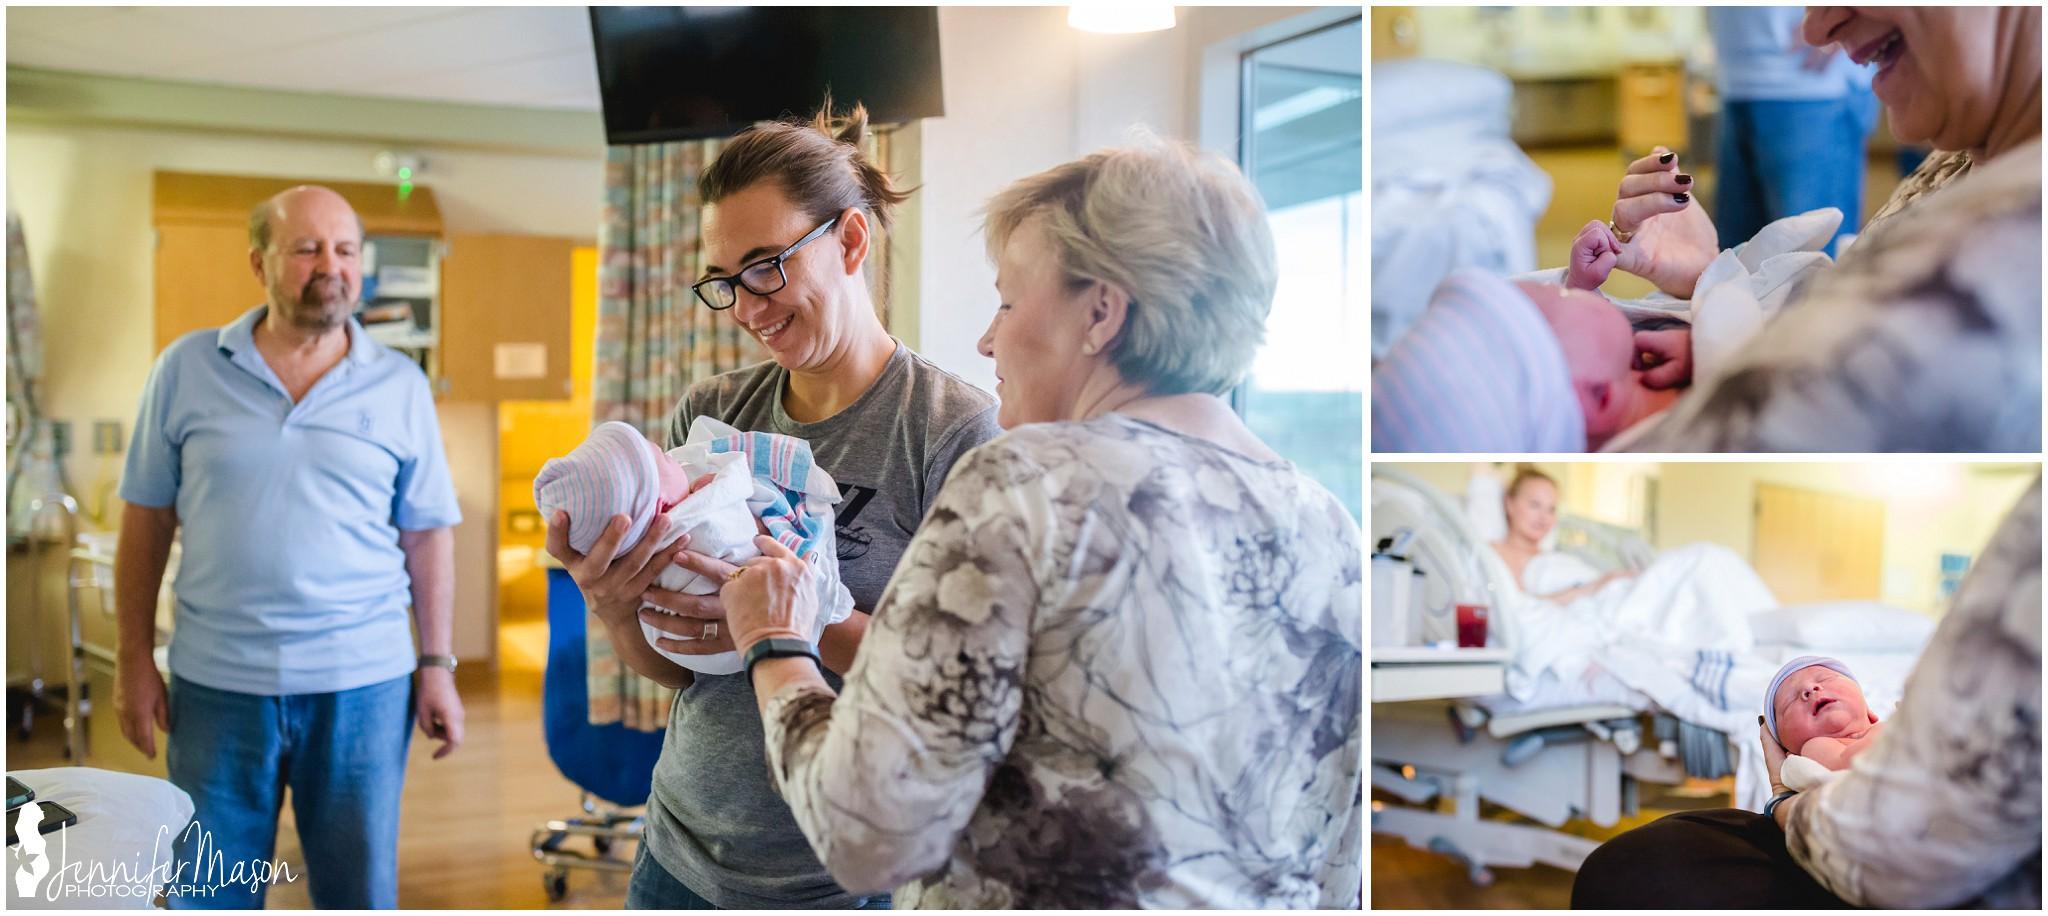 Hospital Birth center birth of little boy